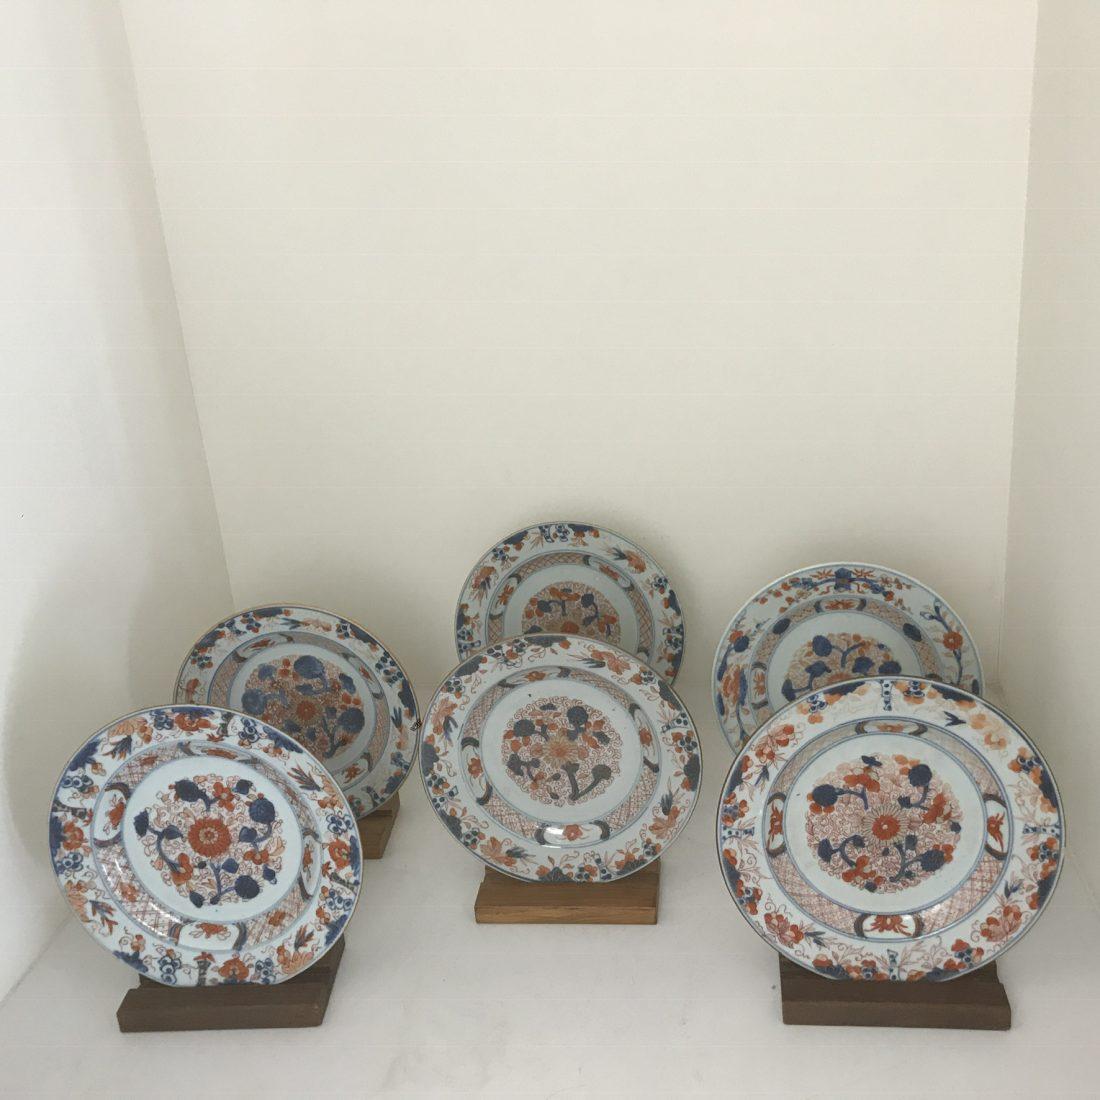 Een zes-tal Imari porseleinen borden, China, 18e eeuw